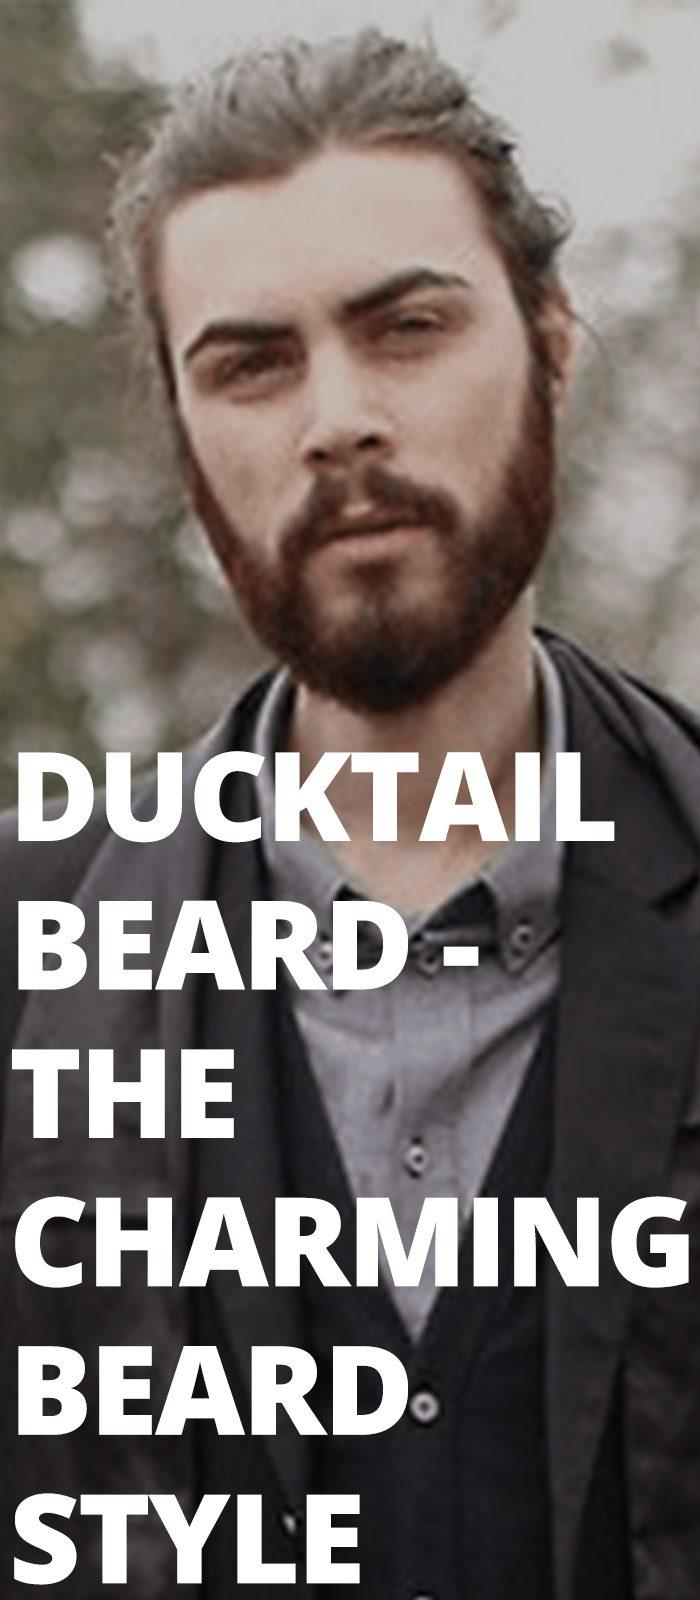 Ducktail Beard - The Charming Beard Style